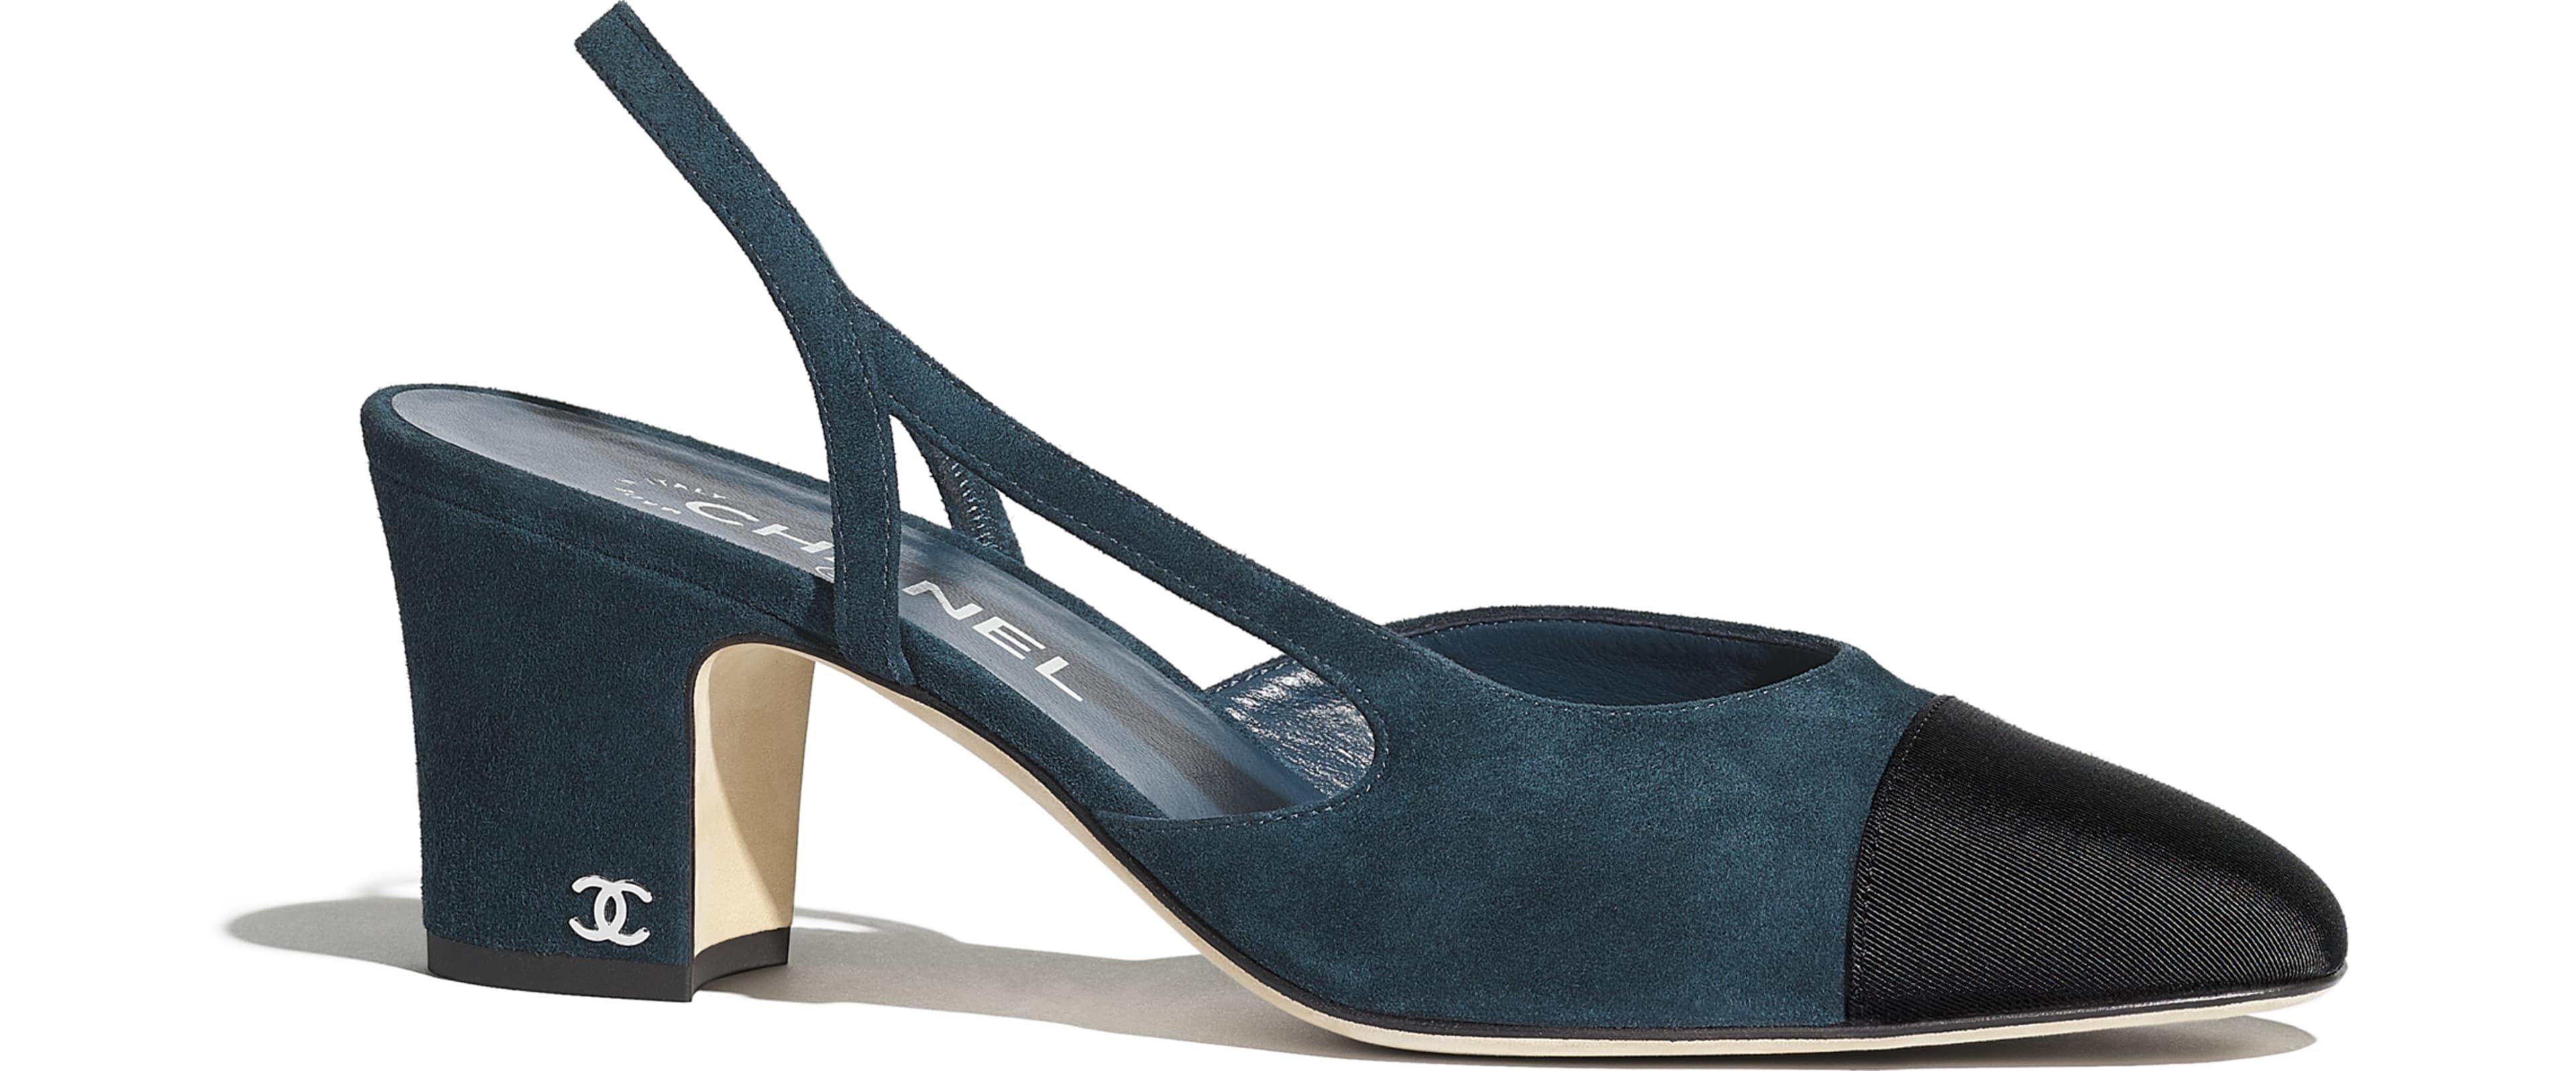 Suede Calfskin & Grosgrain Blue & Black